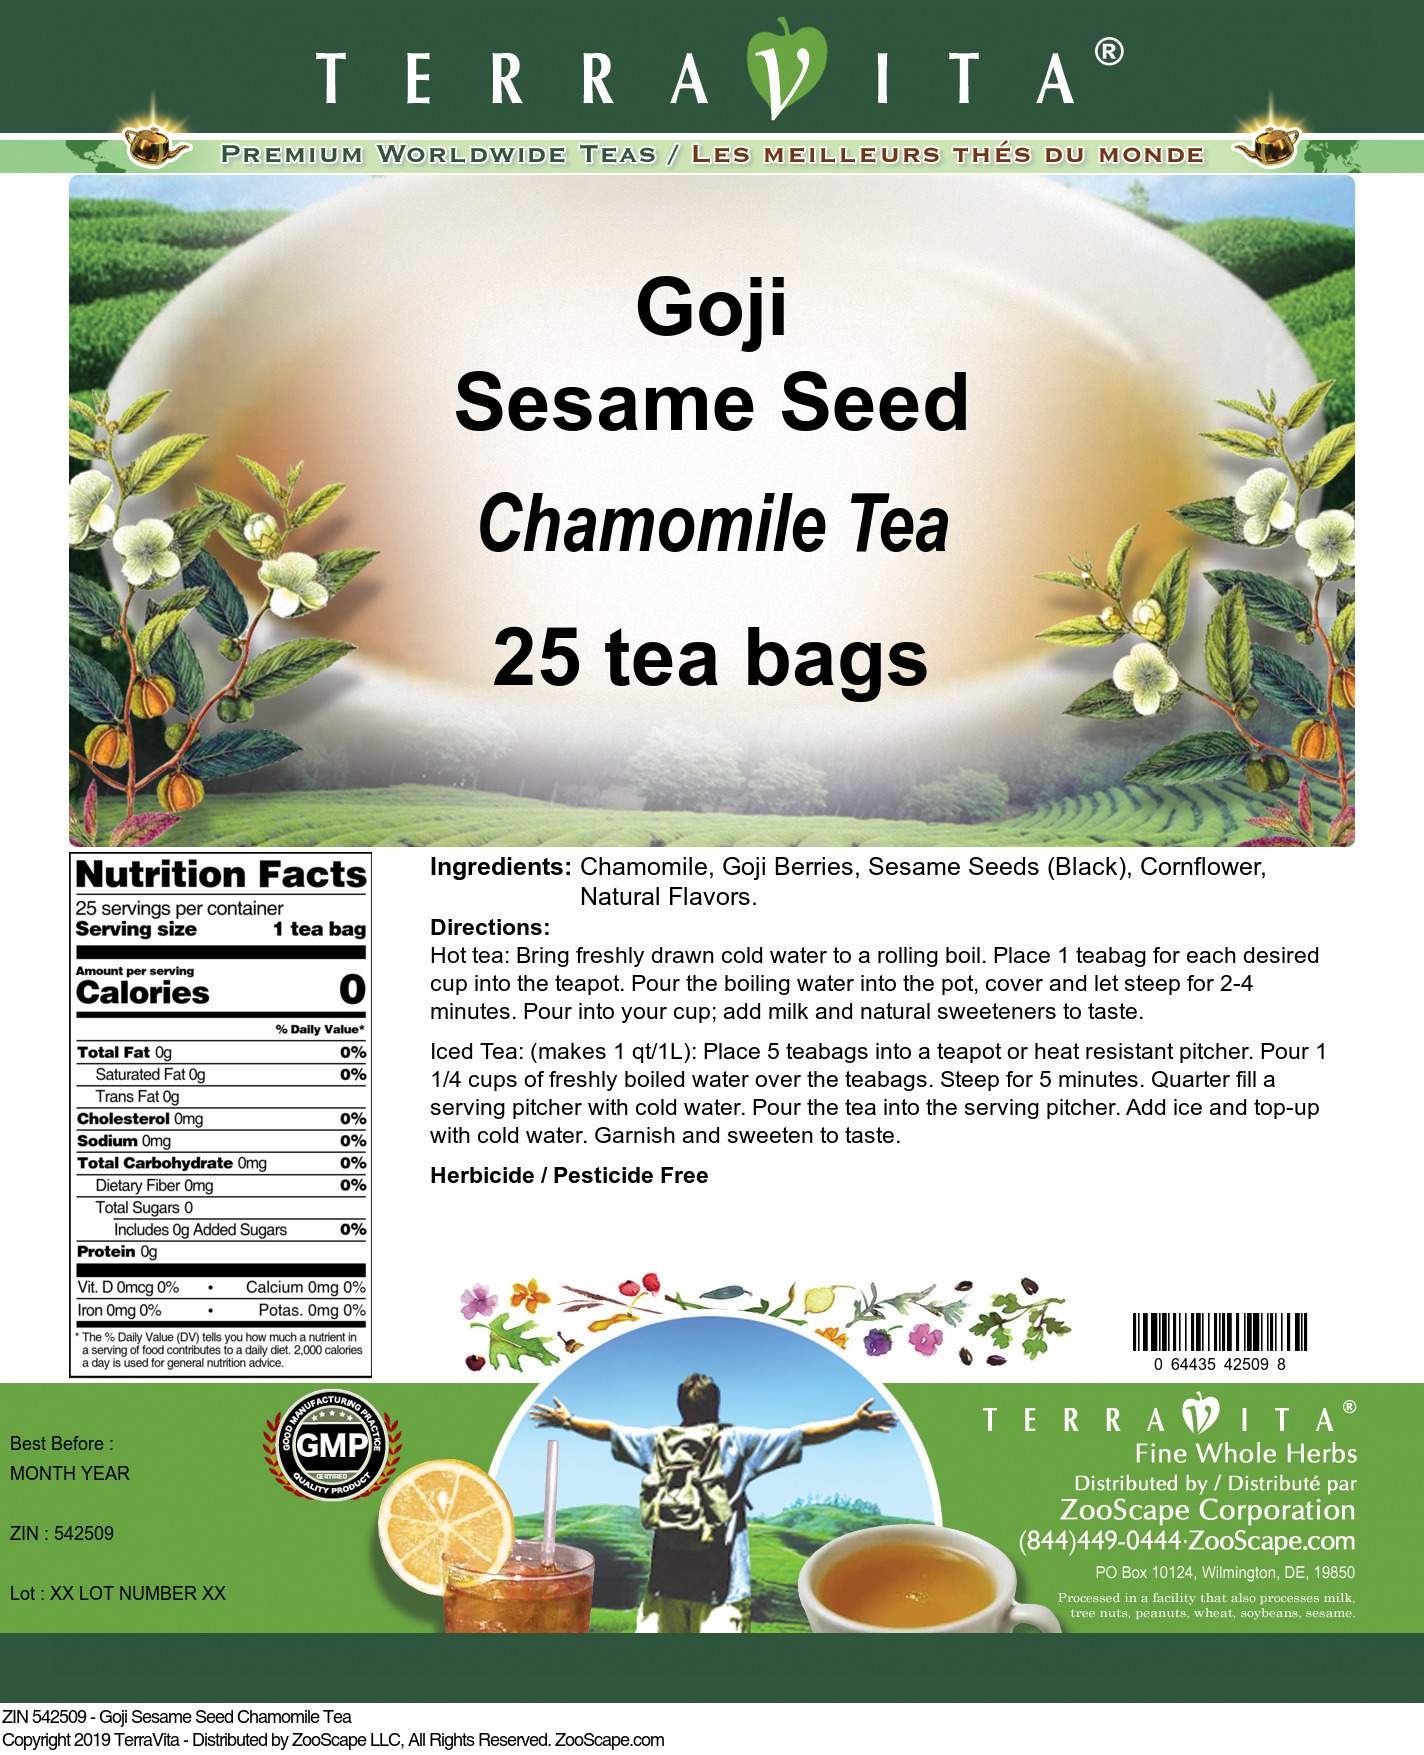 Goji Sesame Seed Chamomile Tea